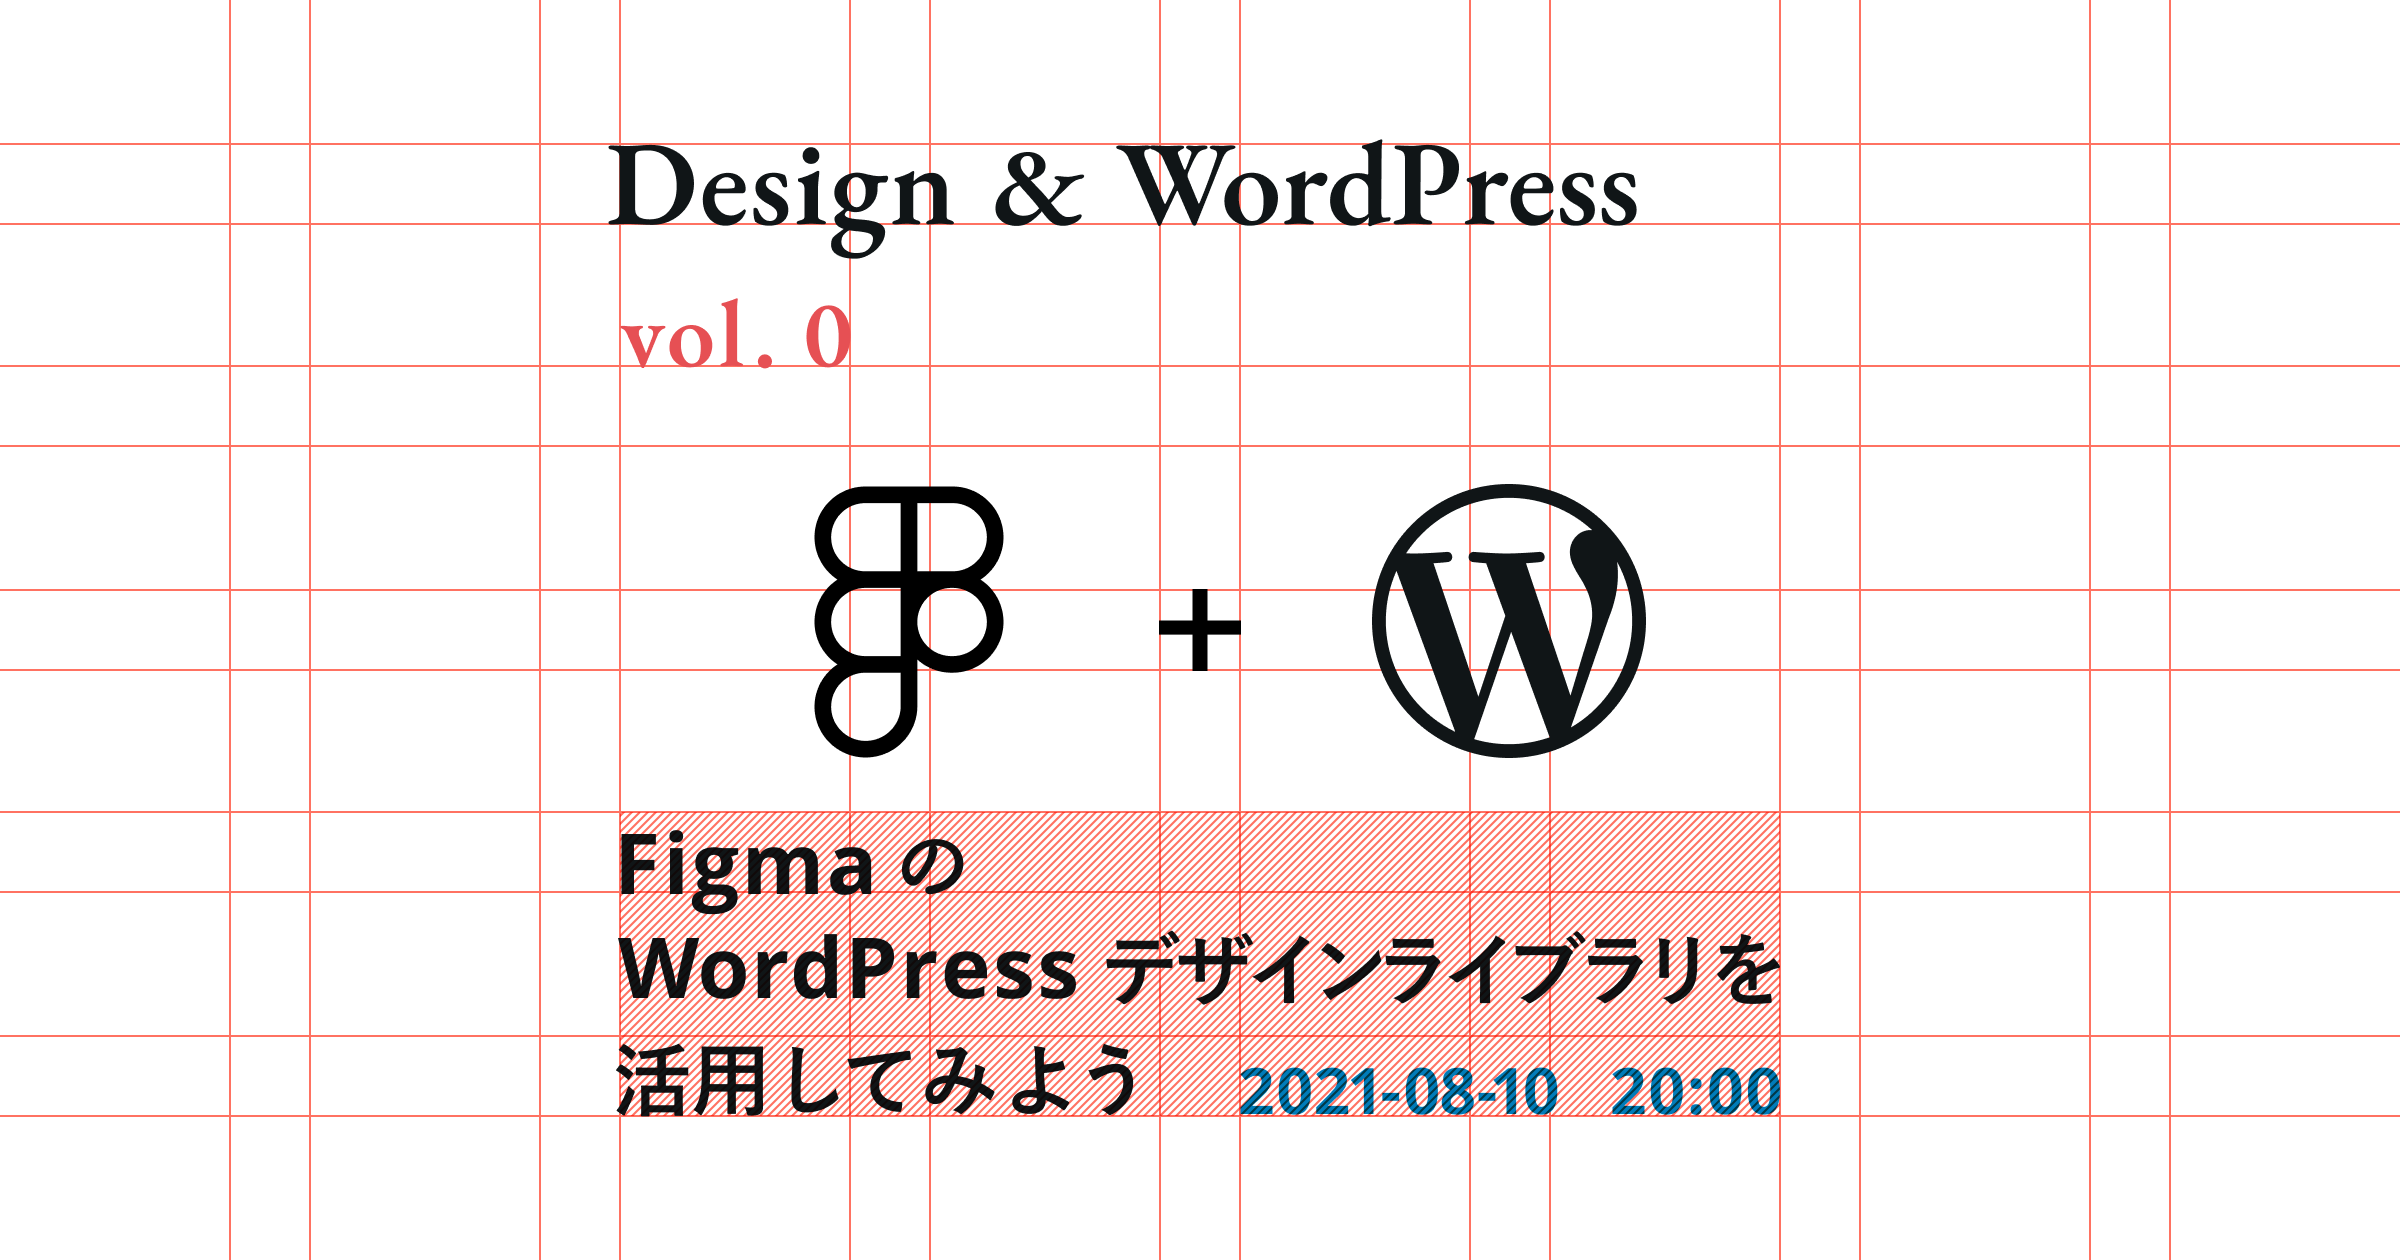 FigmaのWordPressデザインライブラリを活用してみよう